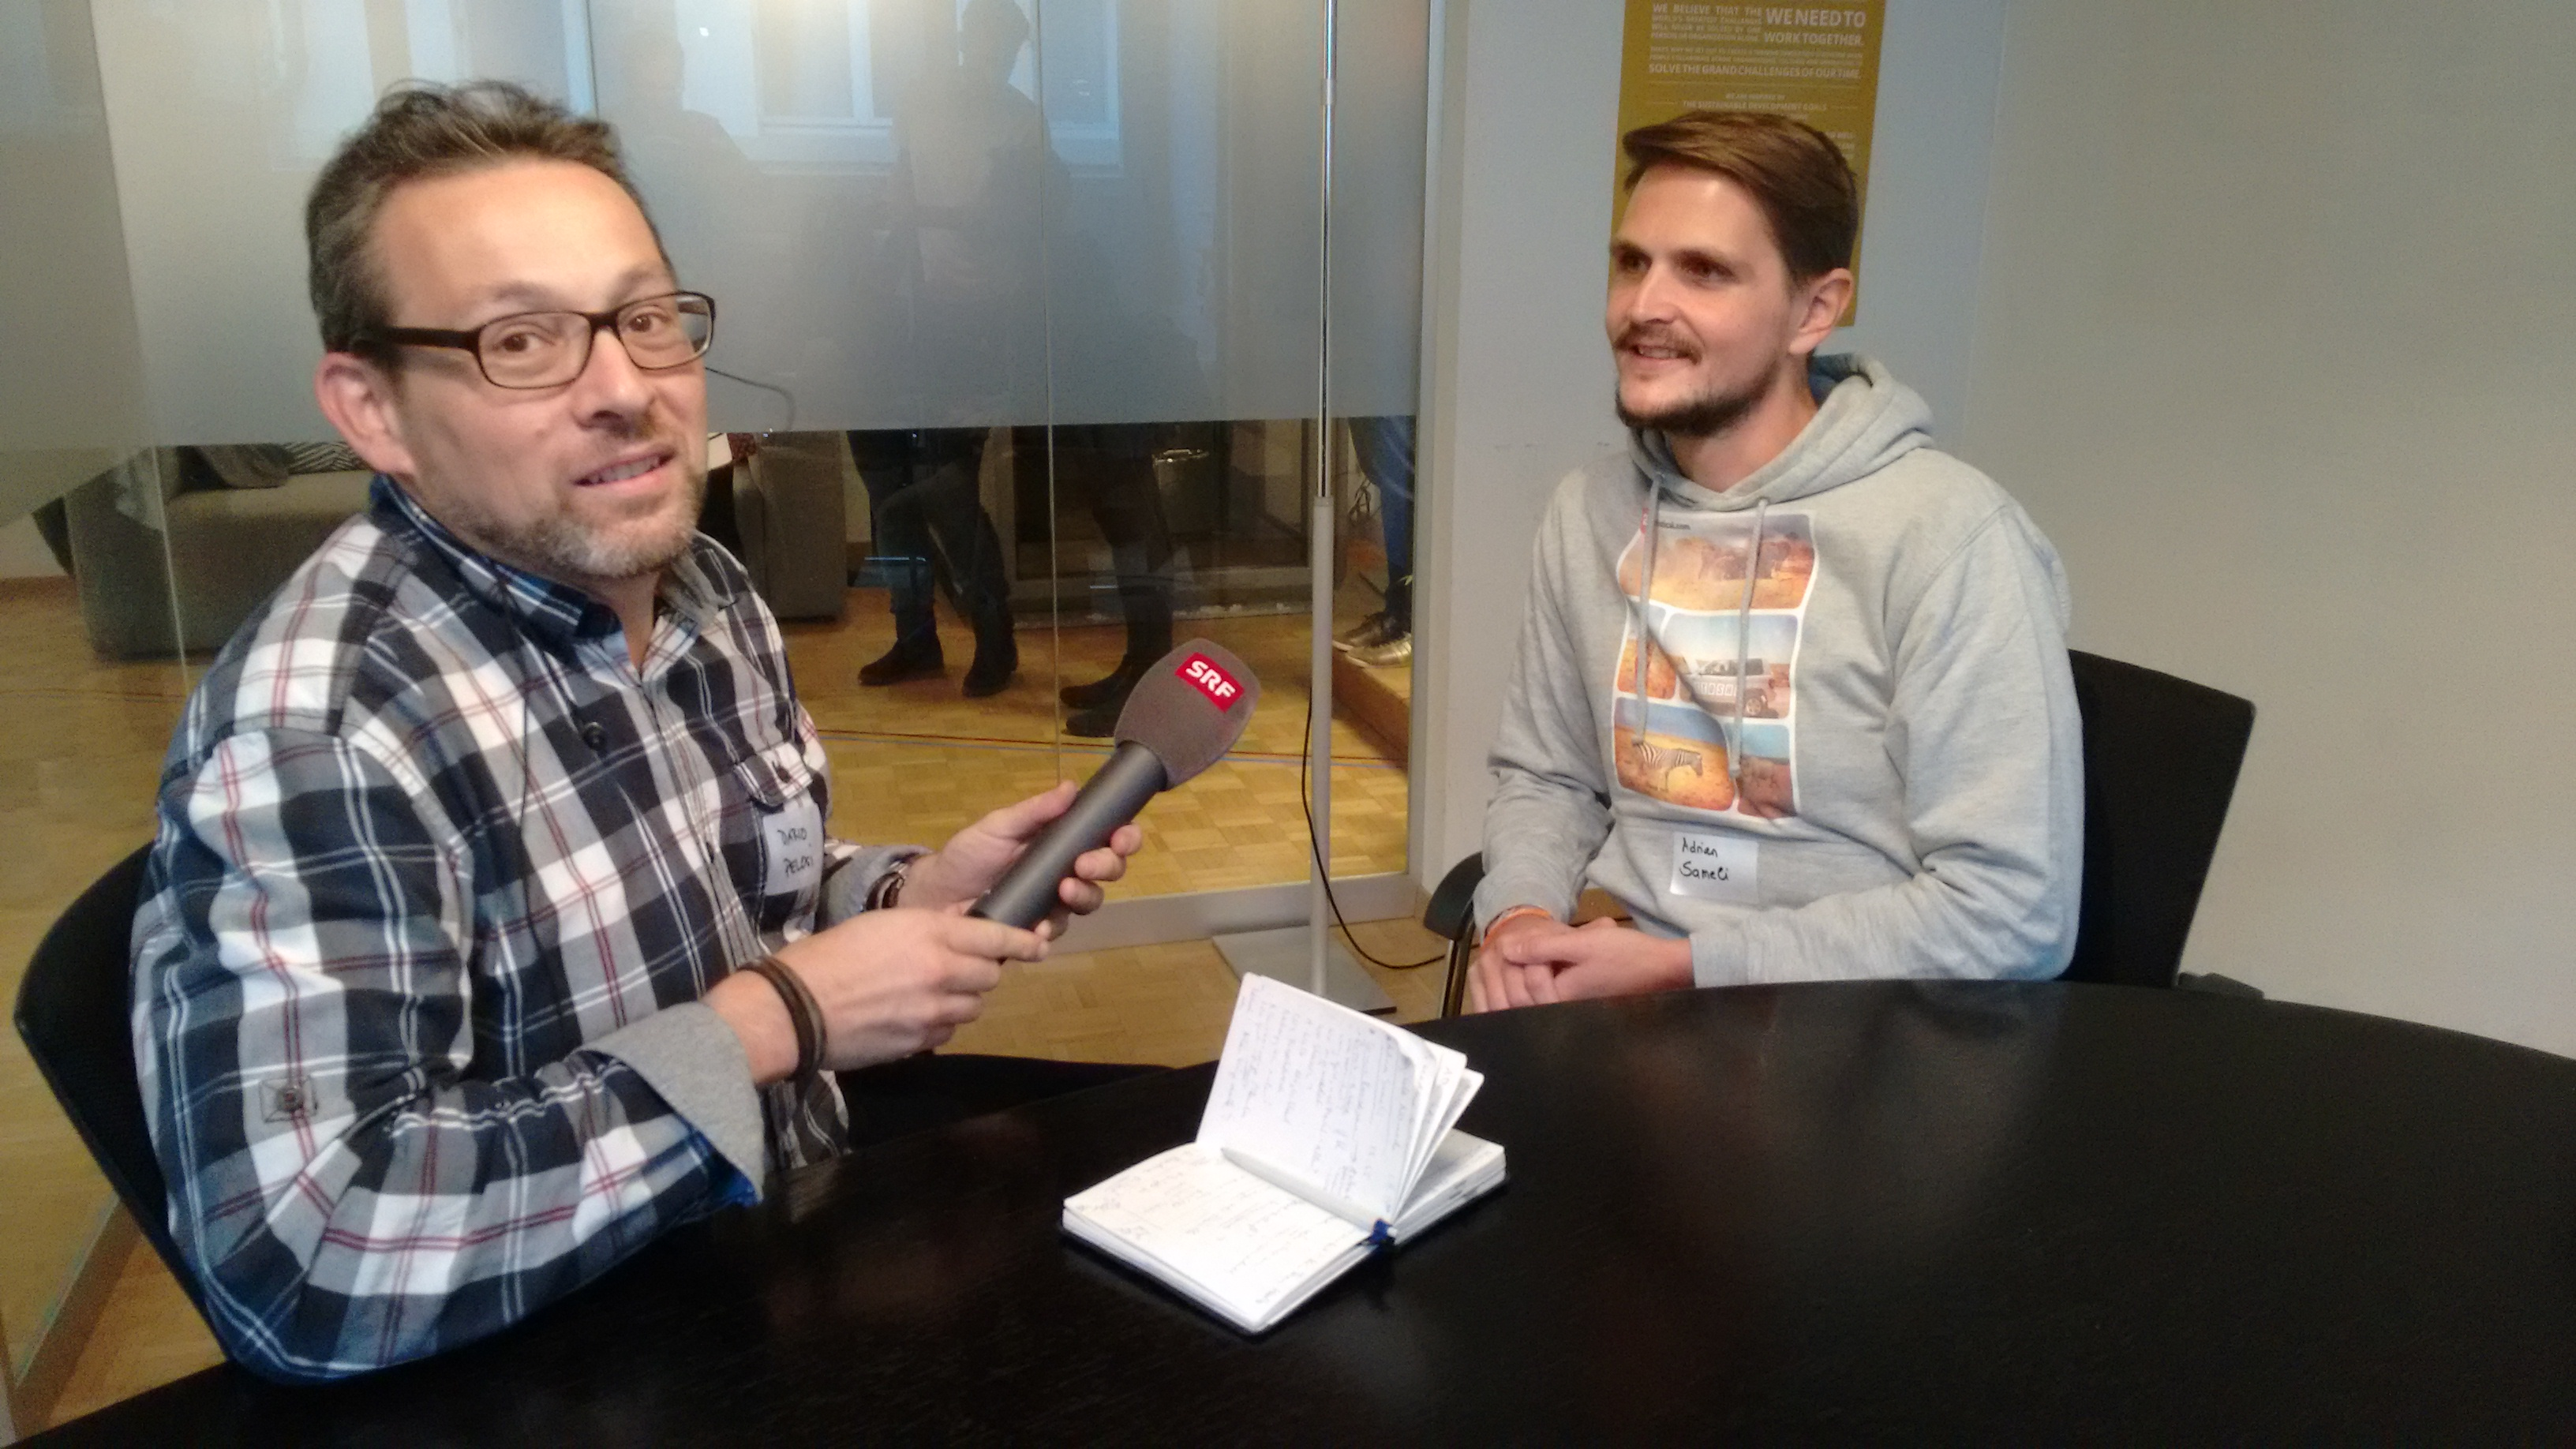 Dario Pelosi SRF im Interview mit Adrian Sameli